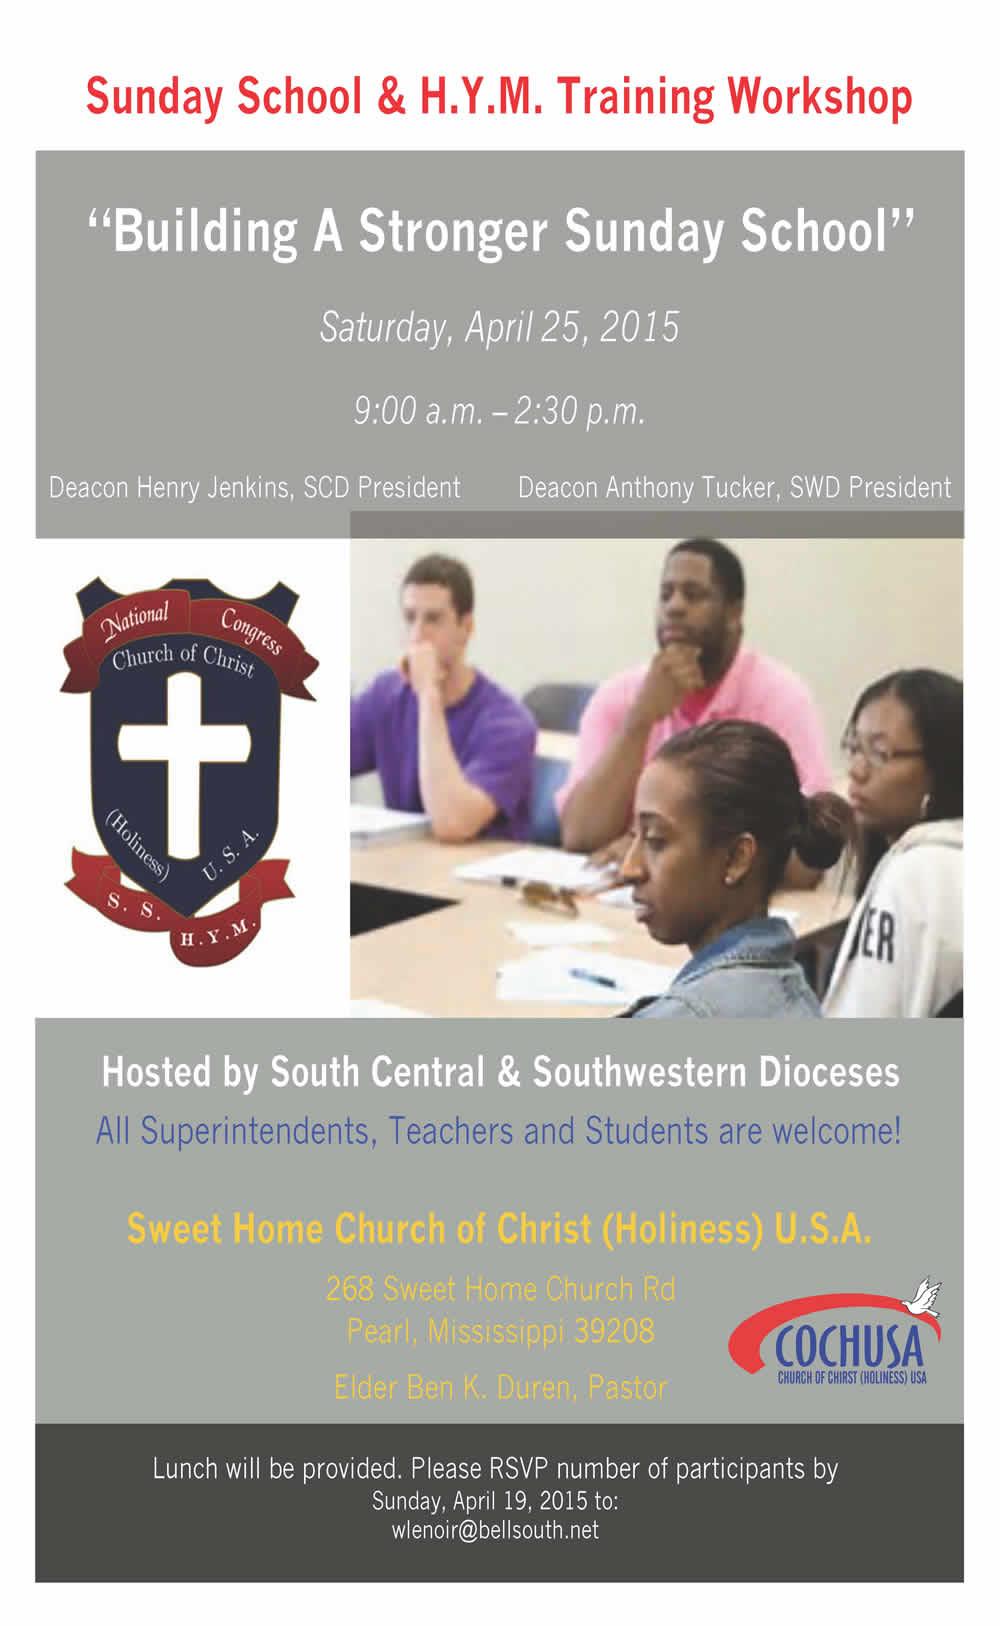 SC_SW_Dioceses_Flyer